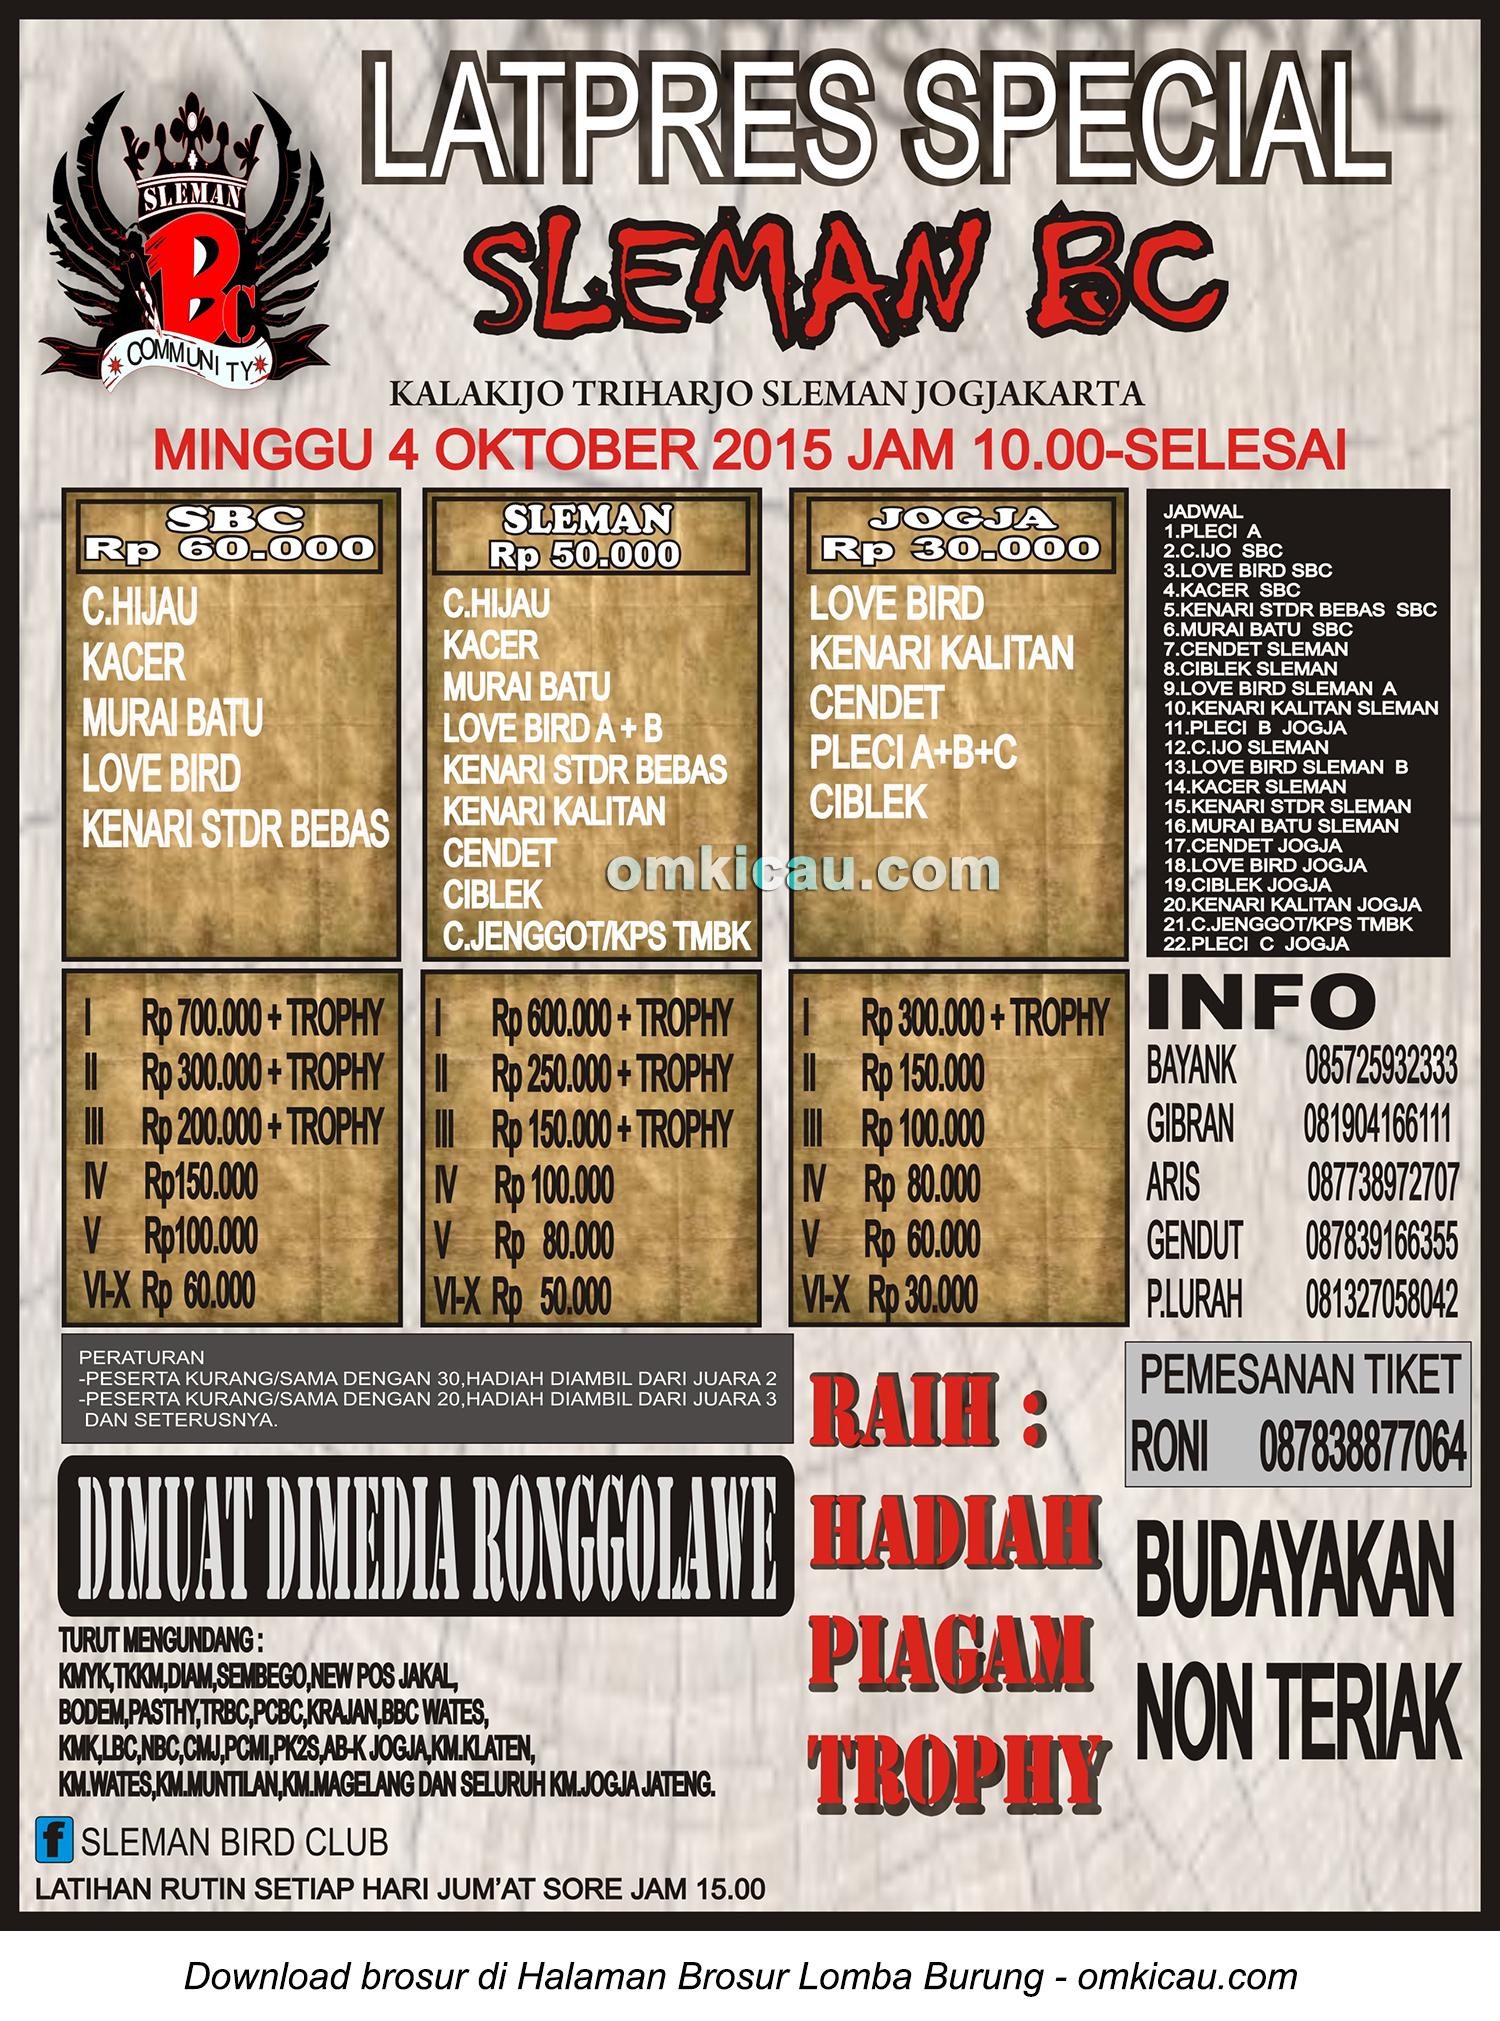 Brosur Latpres Special Sleman BC, 4 Oktober 2015